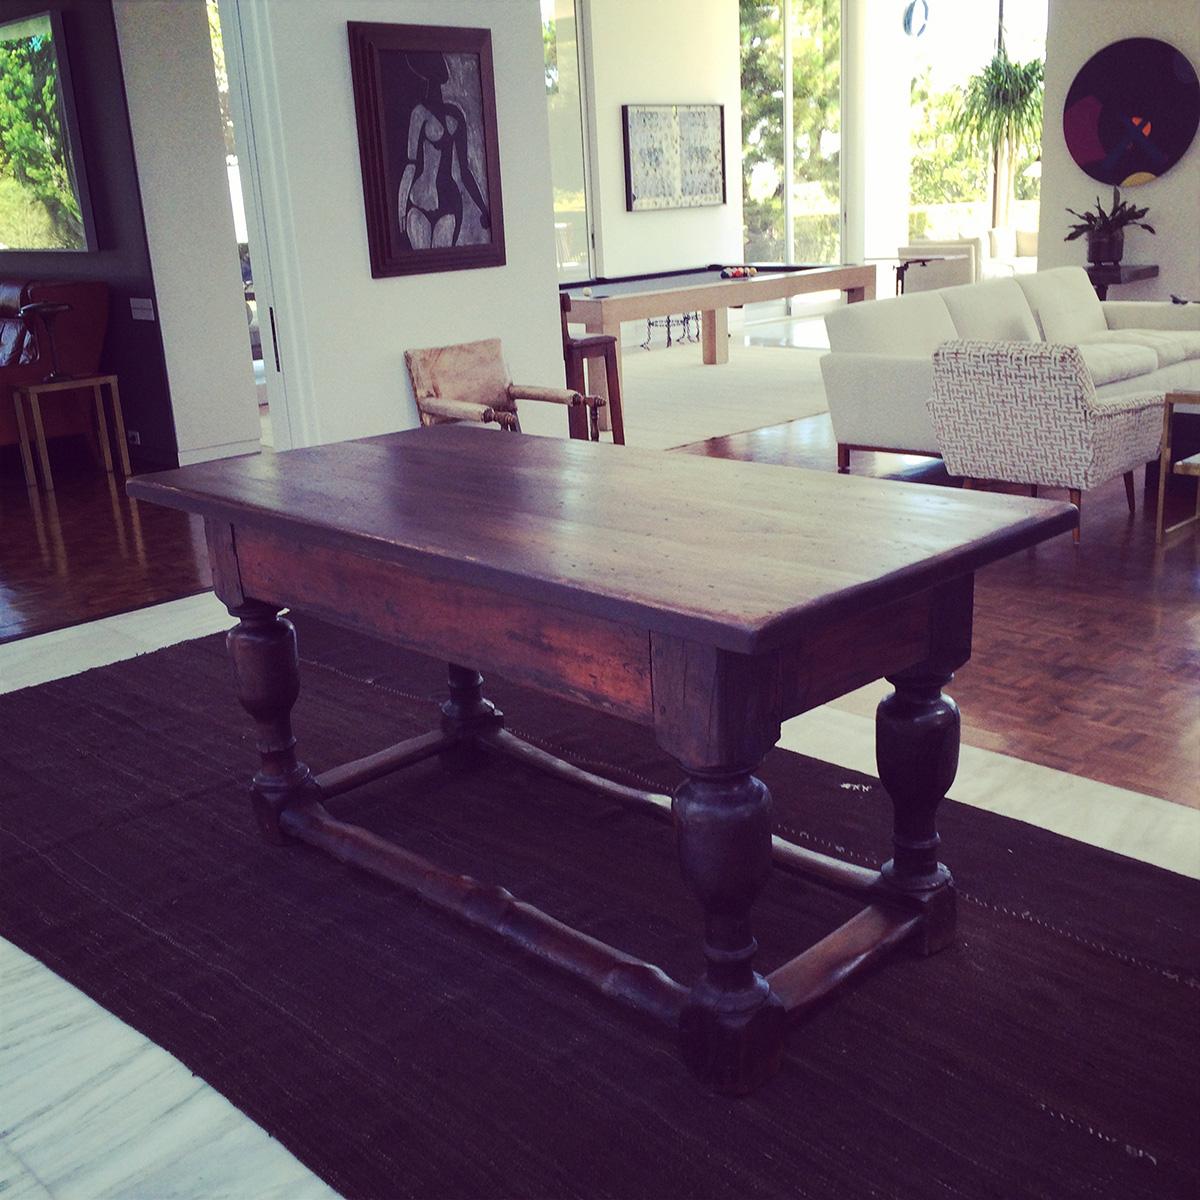 antique-table.jpg